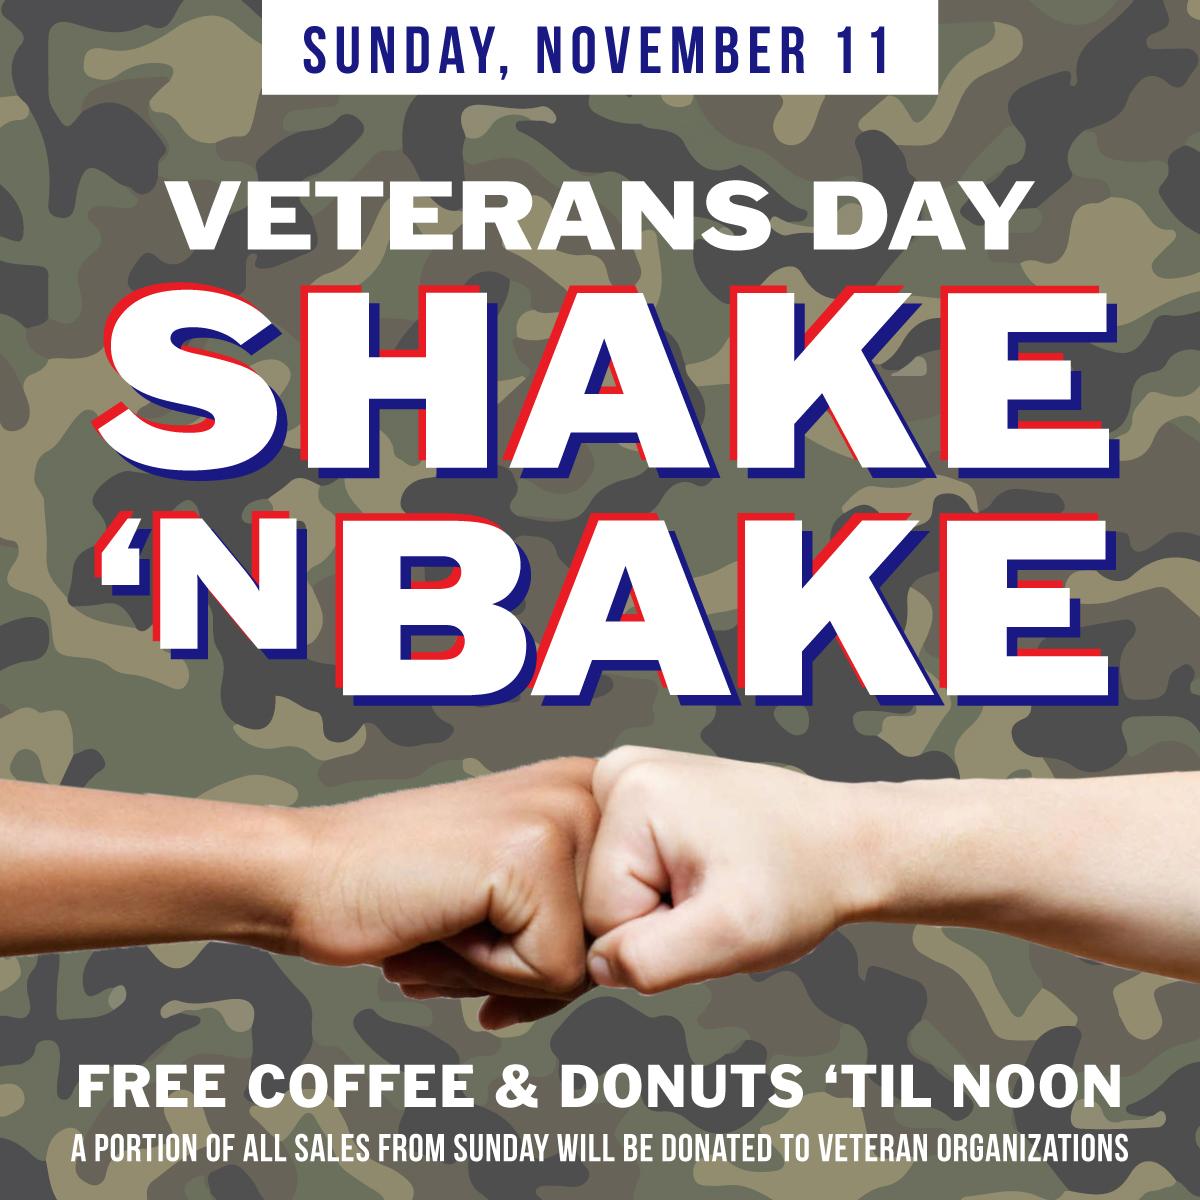 CCM_shake-&-bake-VeteransDay.jpg